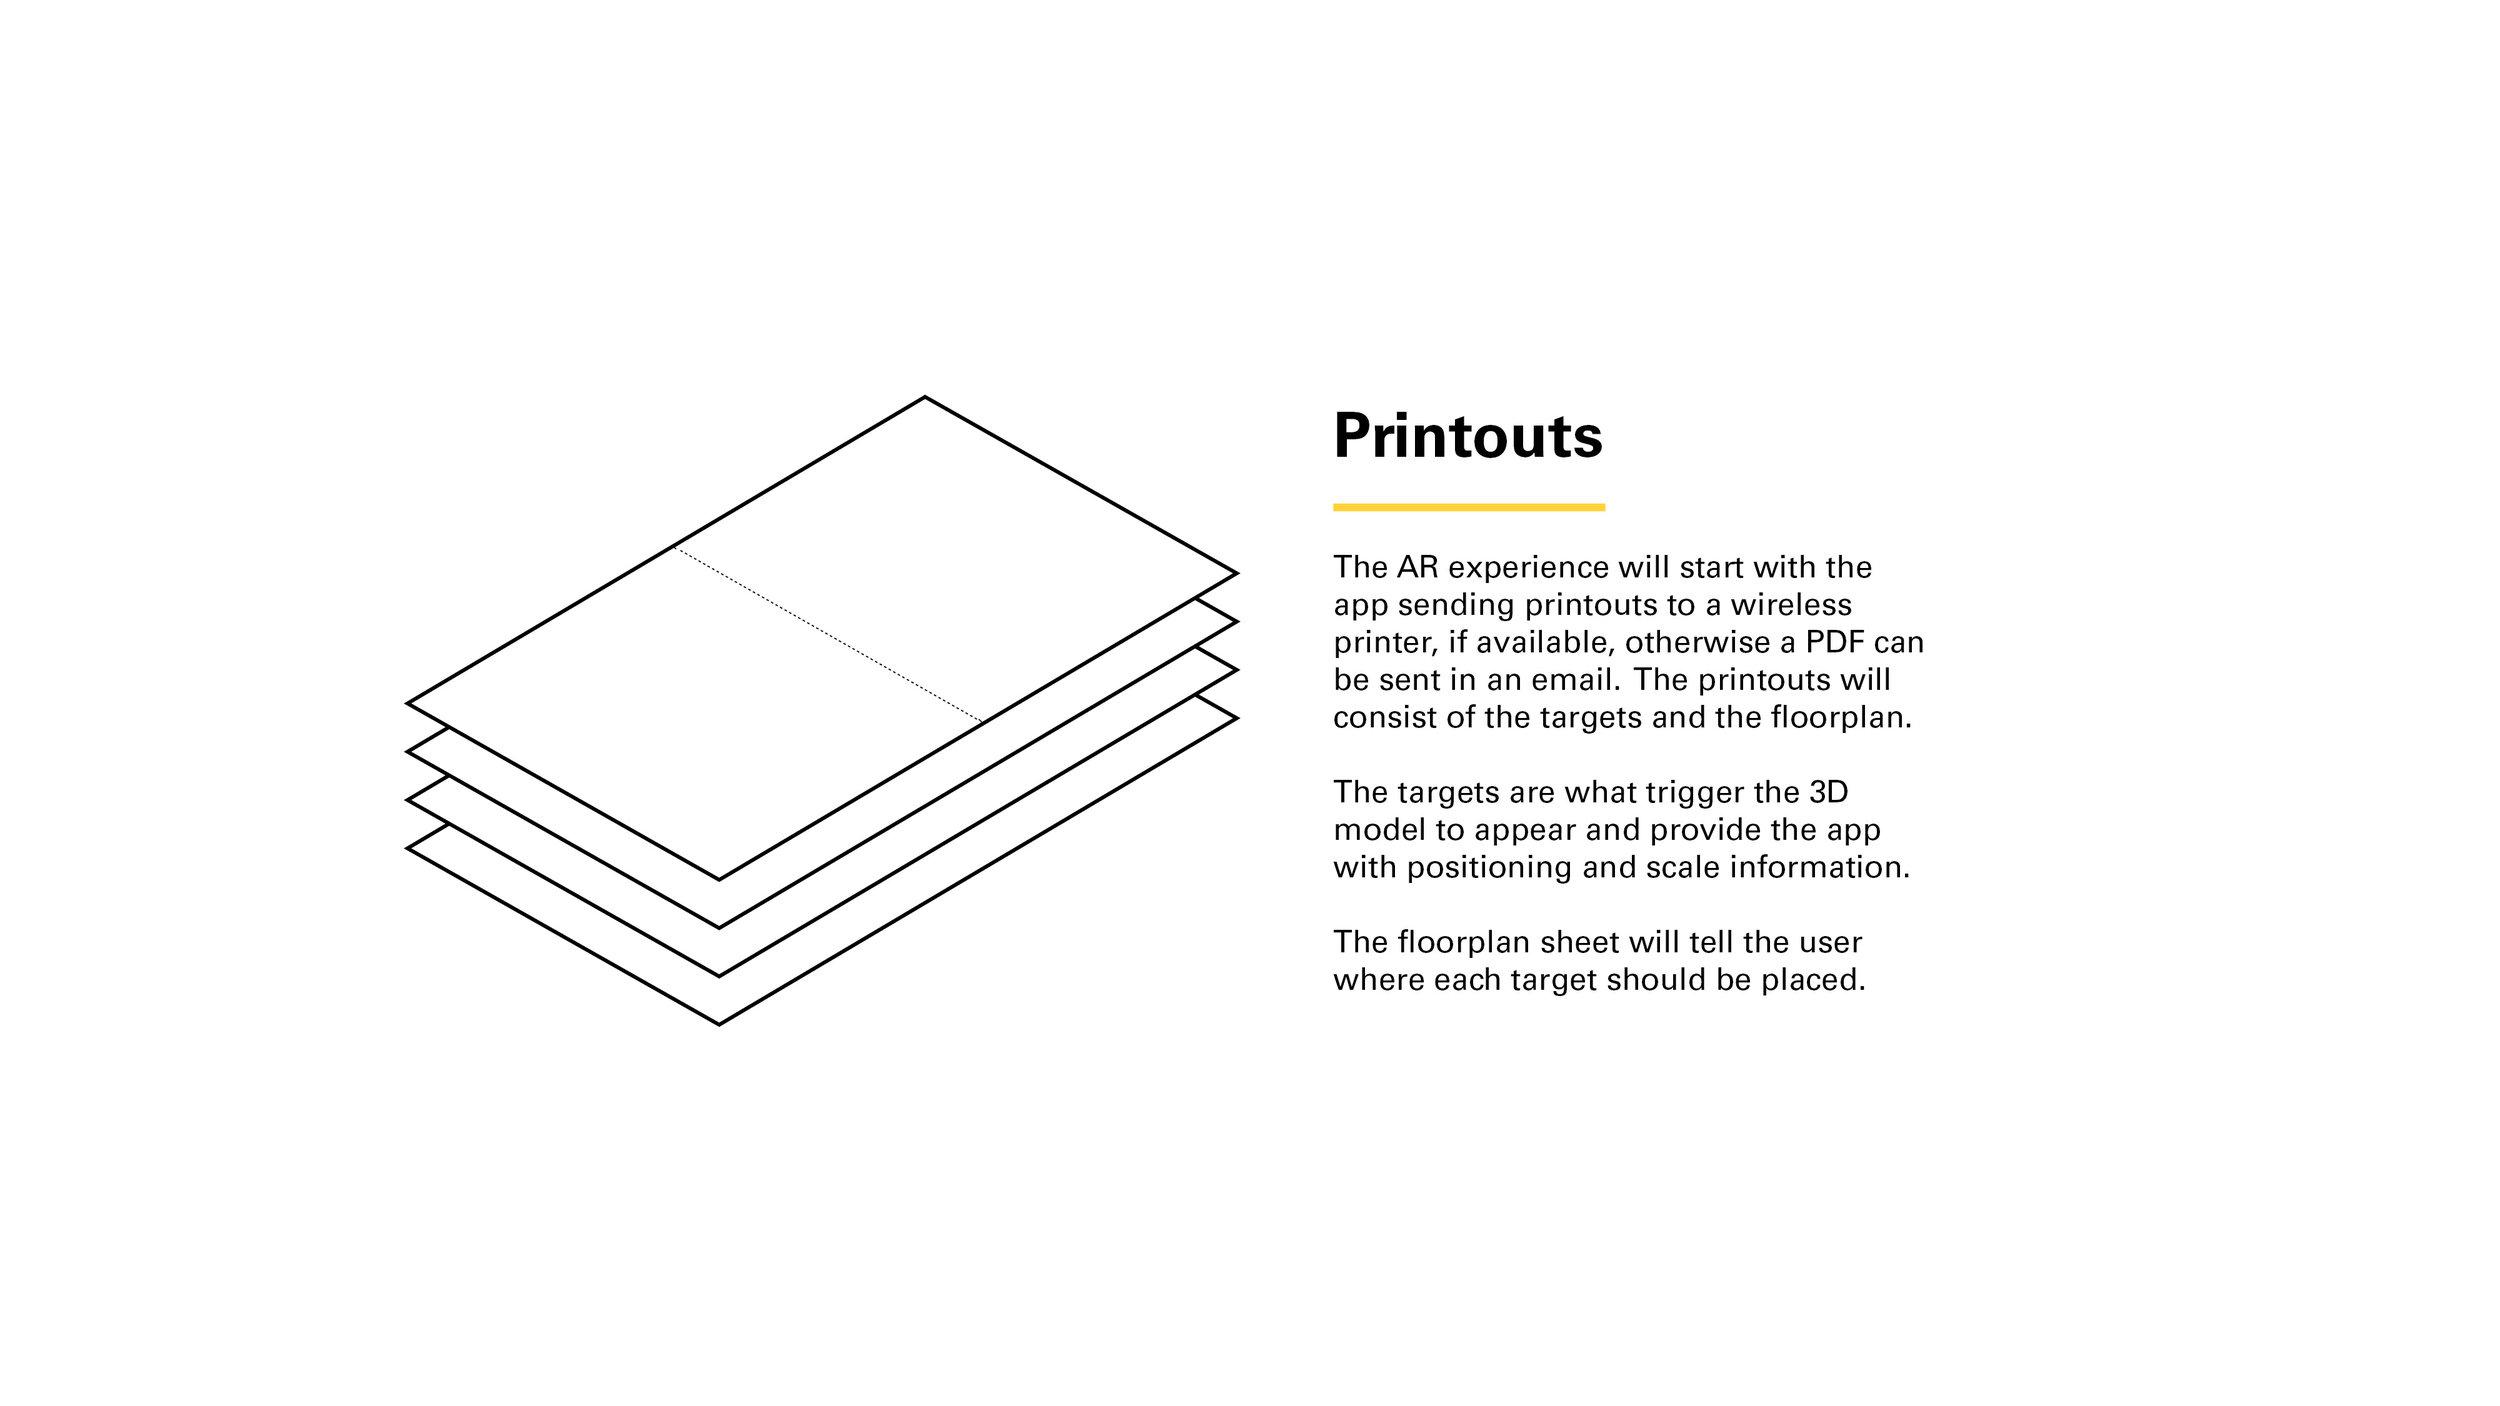 IKEA_AR_Planner_ProcessBook25.jpg